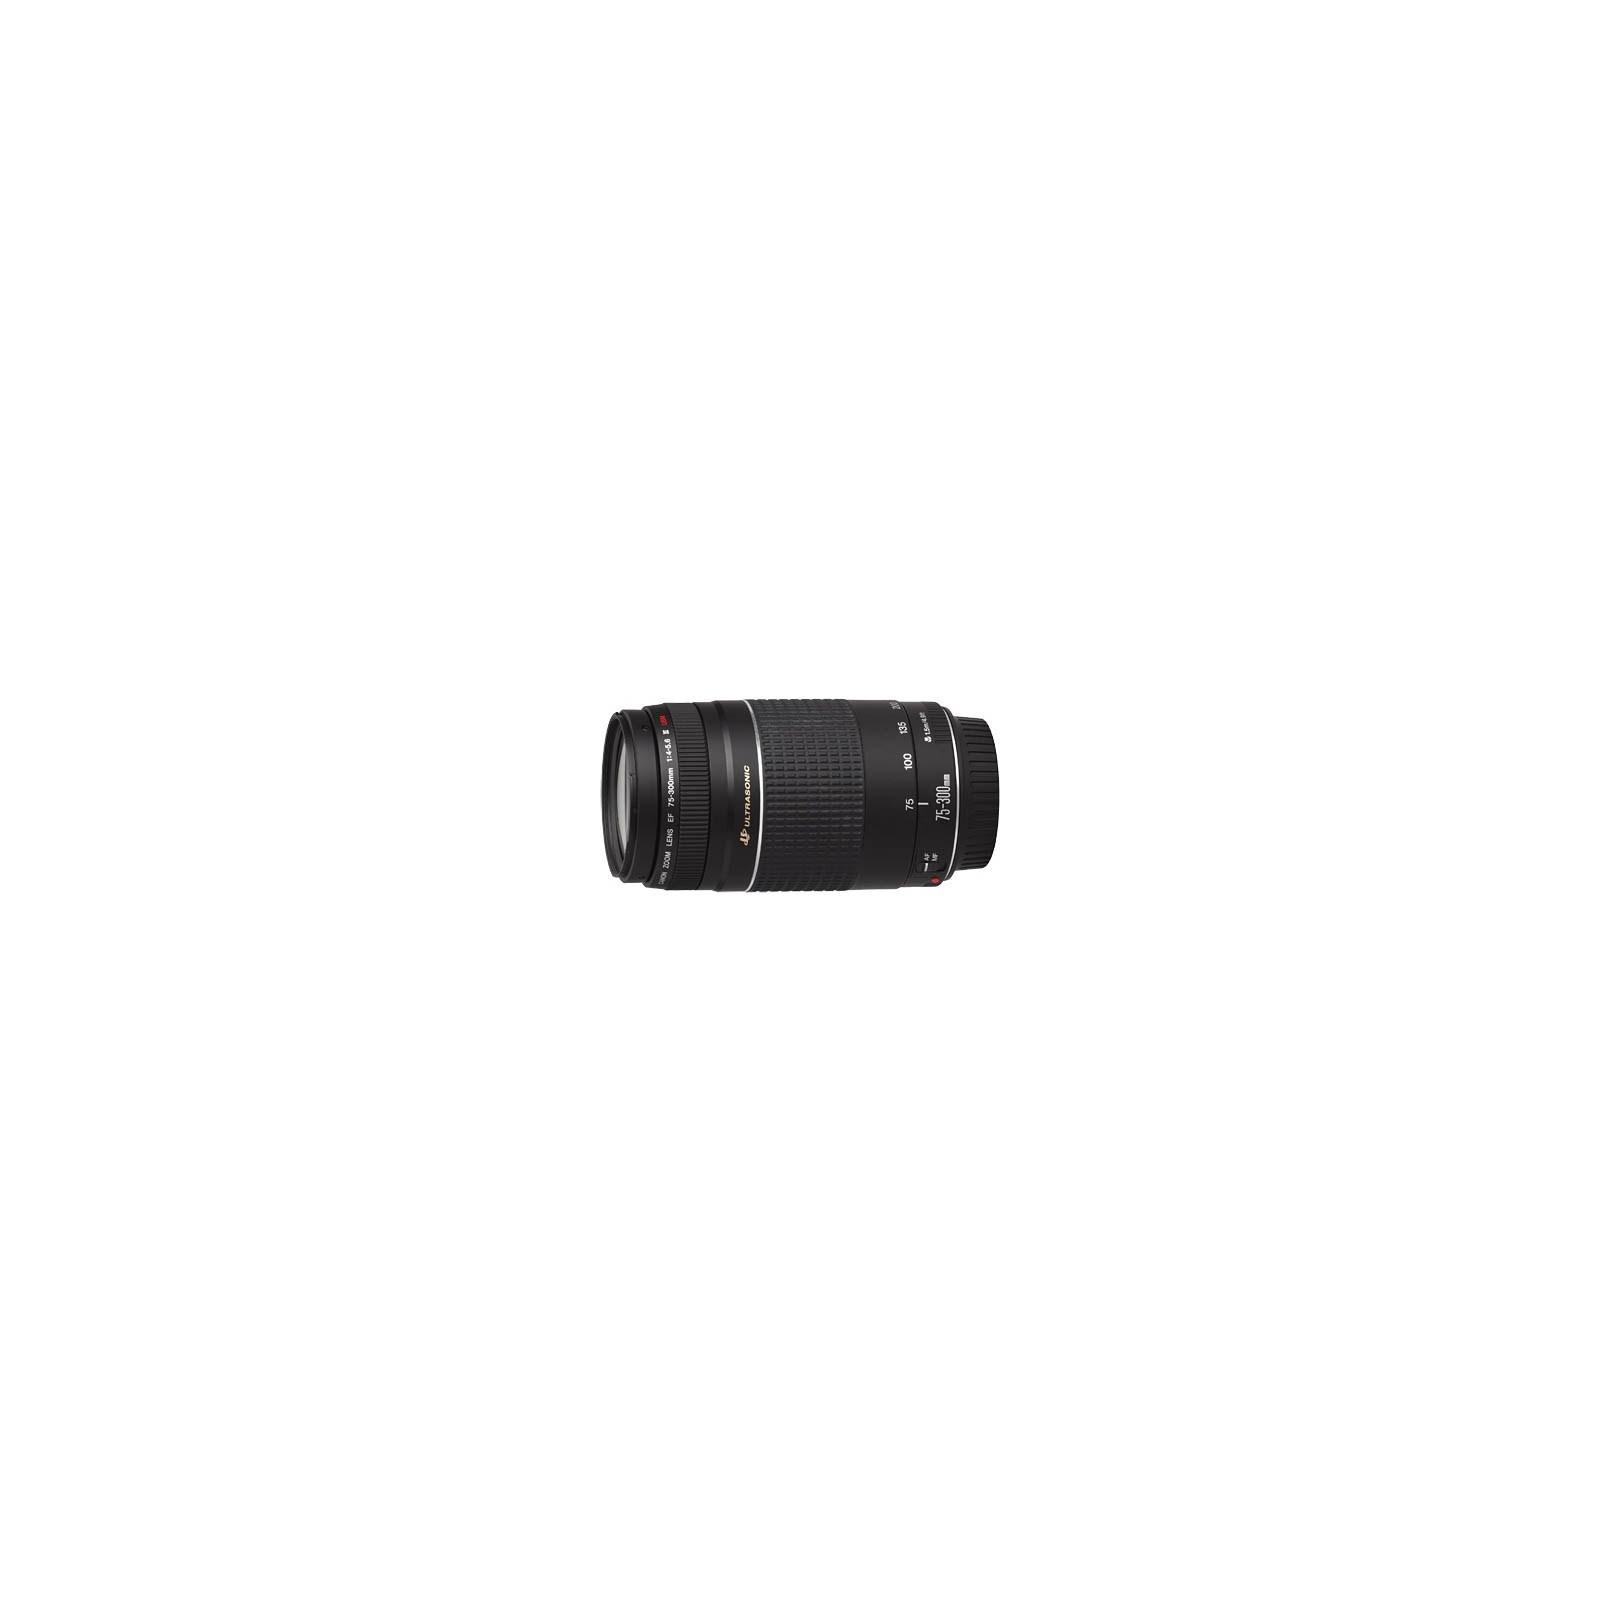 Объектив Canon EF 75-300mm f/4-5.6 III USM (6472A012)